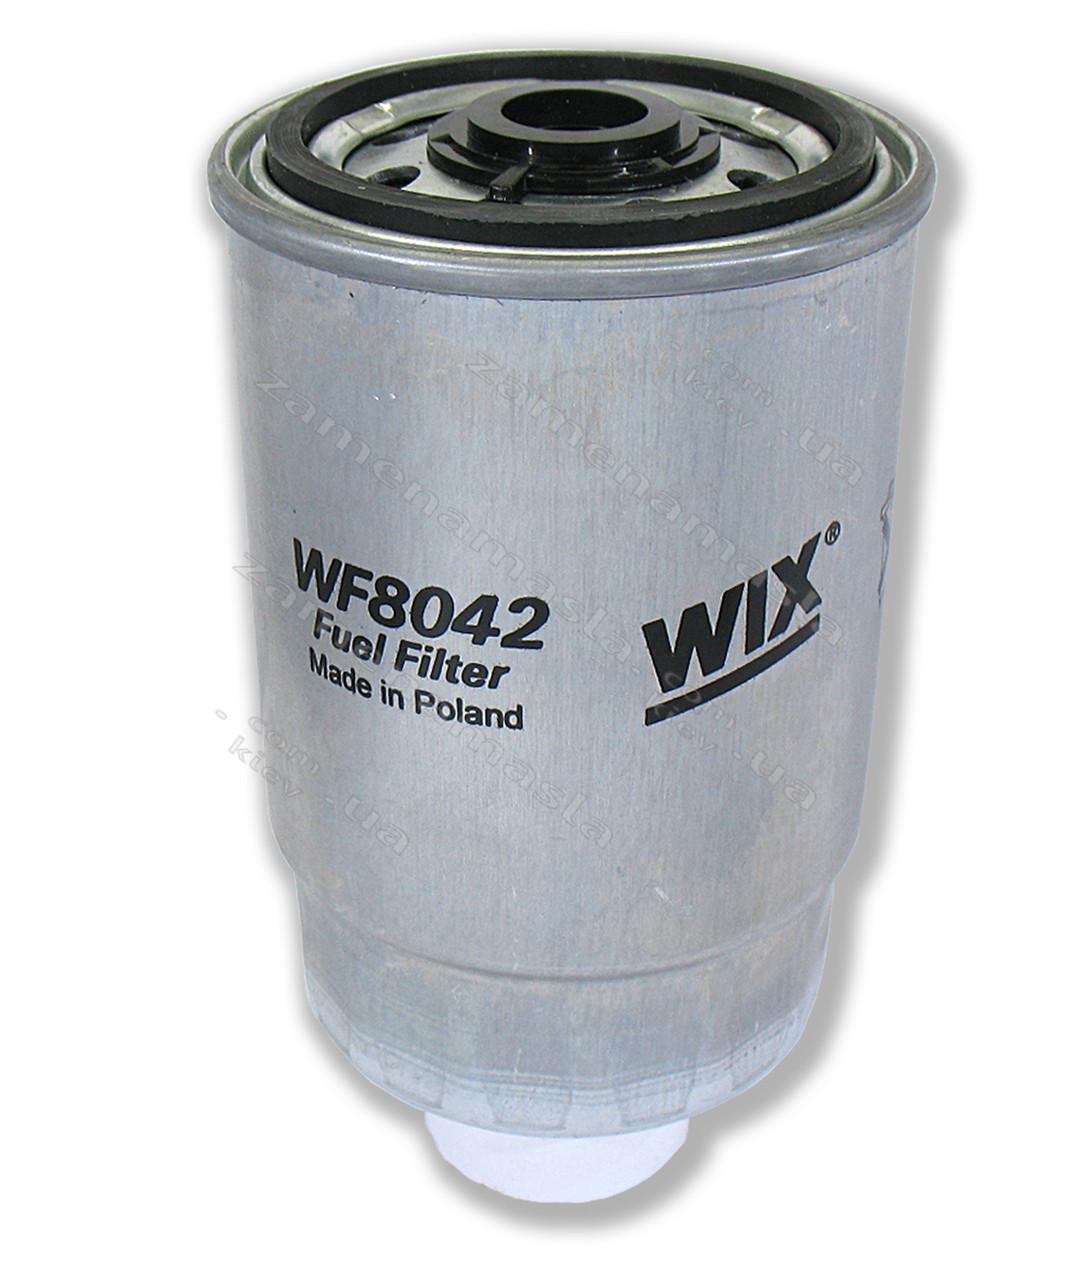 WIX WF8042 аналог ST-302 на Iveco, Audi, Citroën, Fiat, Renault